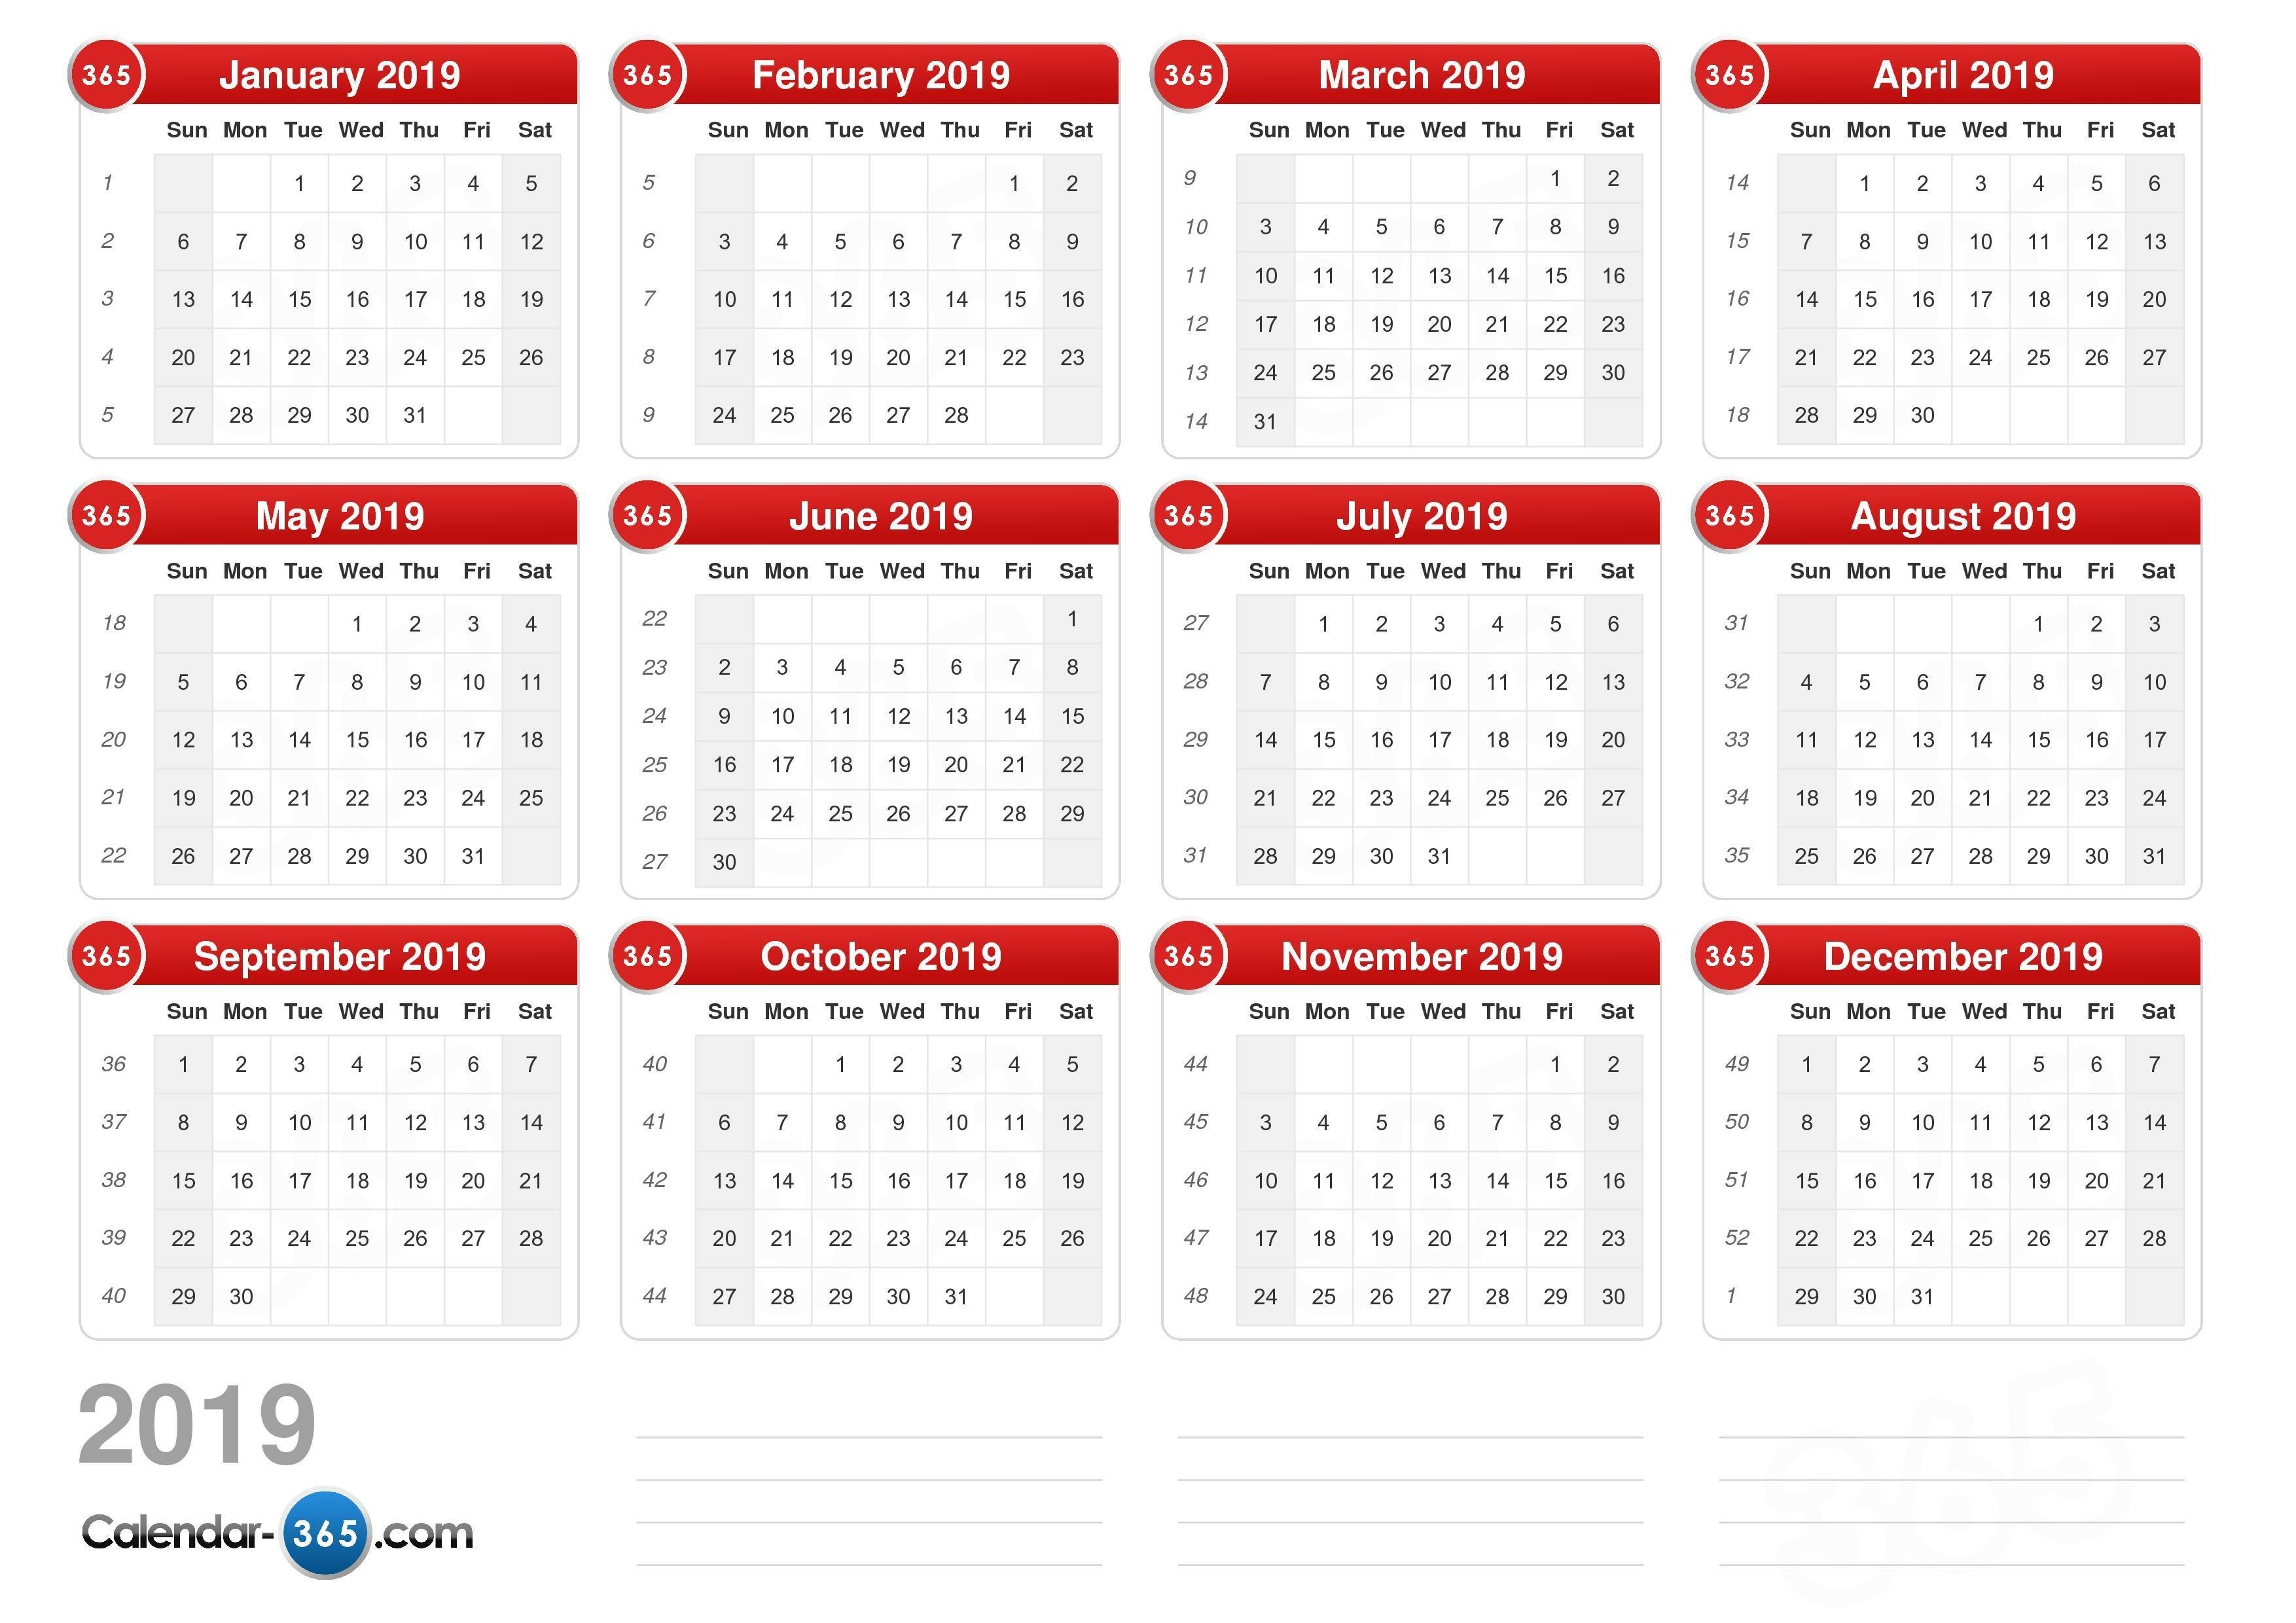 2019 Calendar Calendar 2019 Date And Time